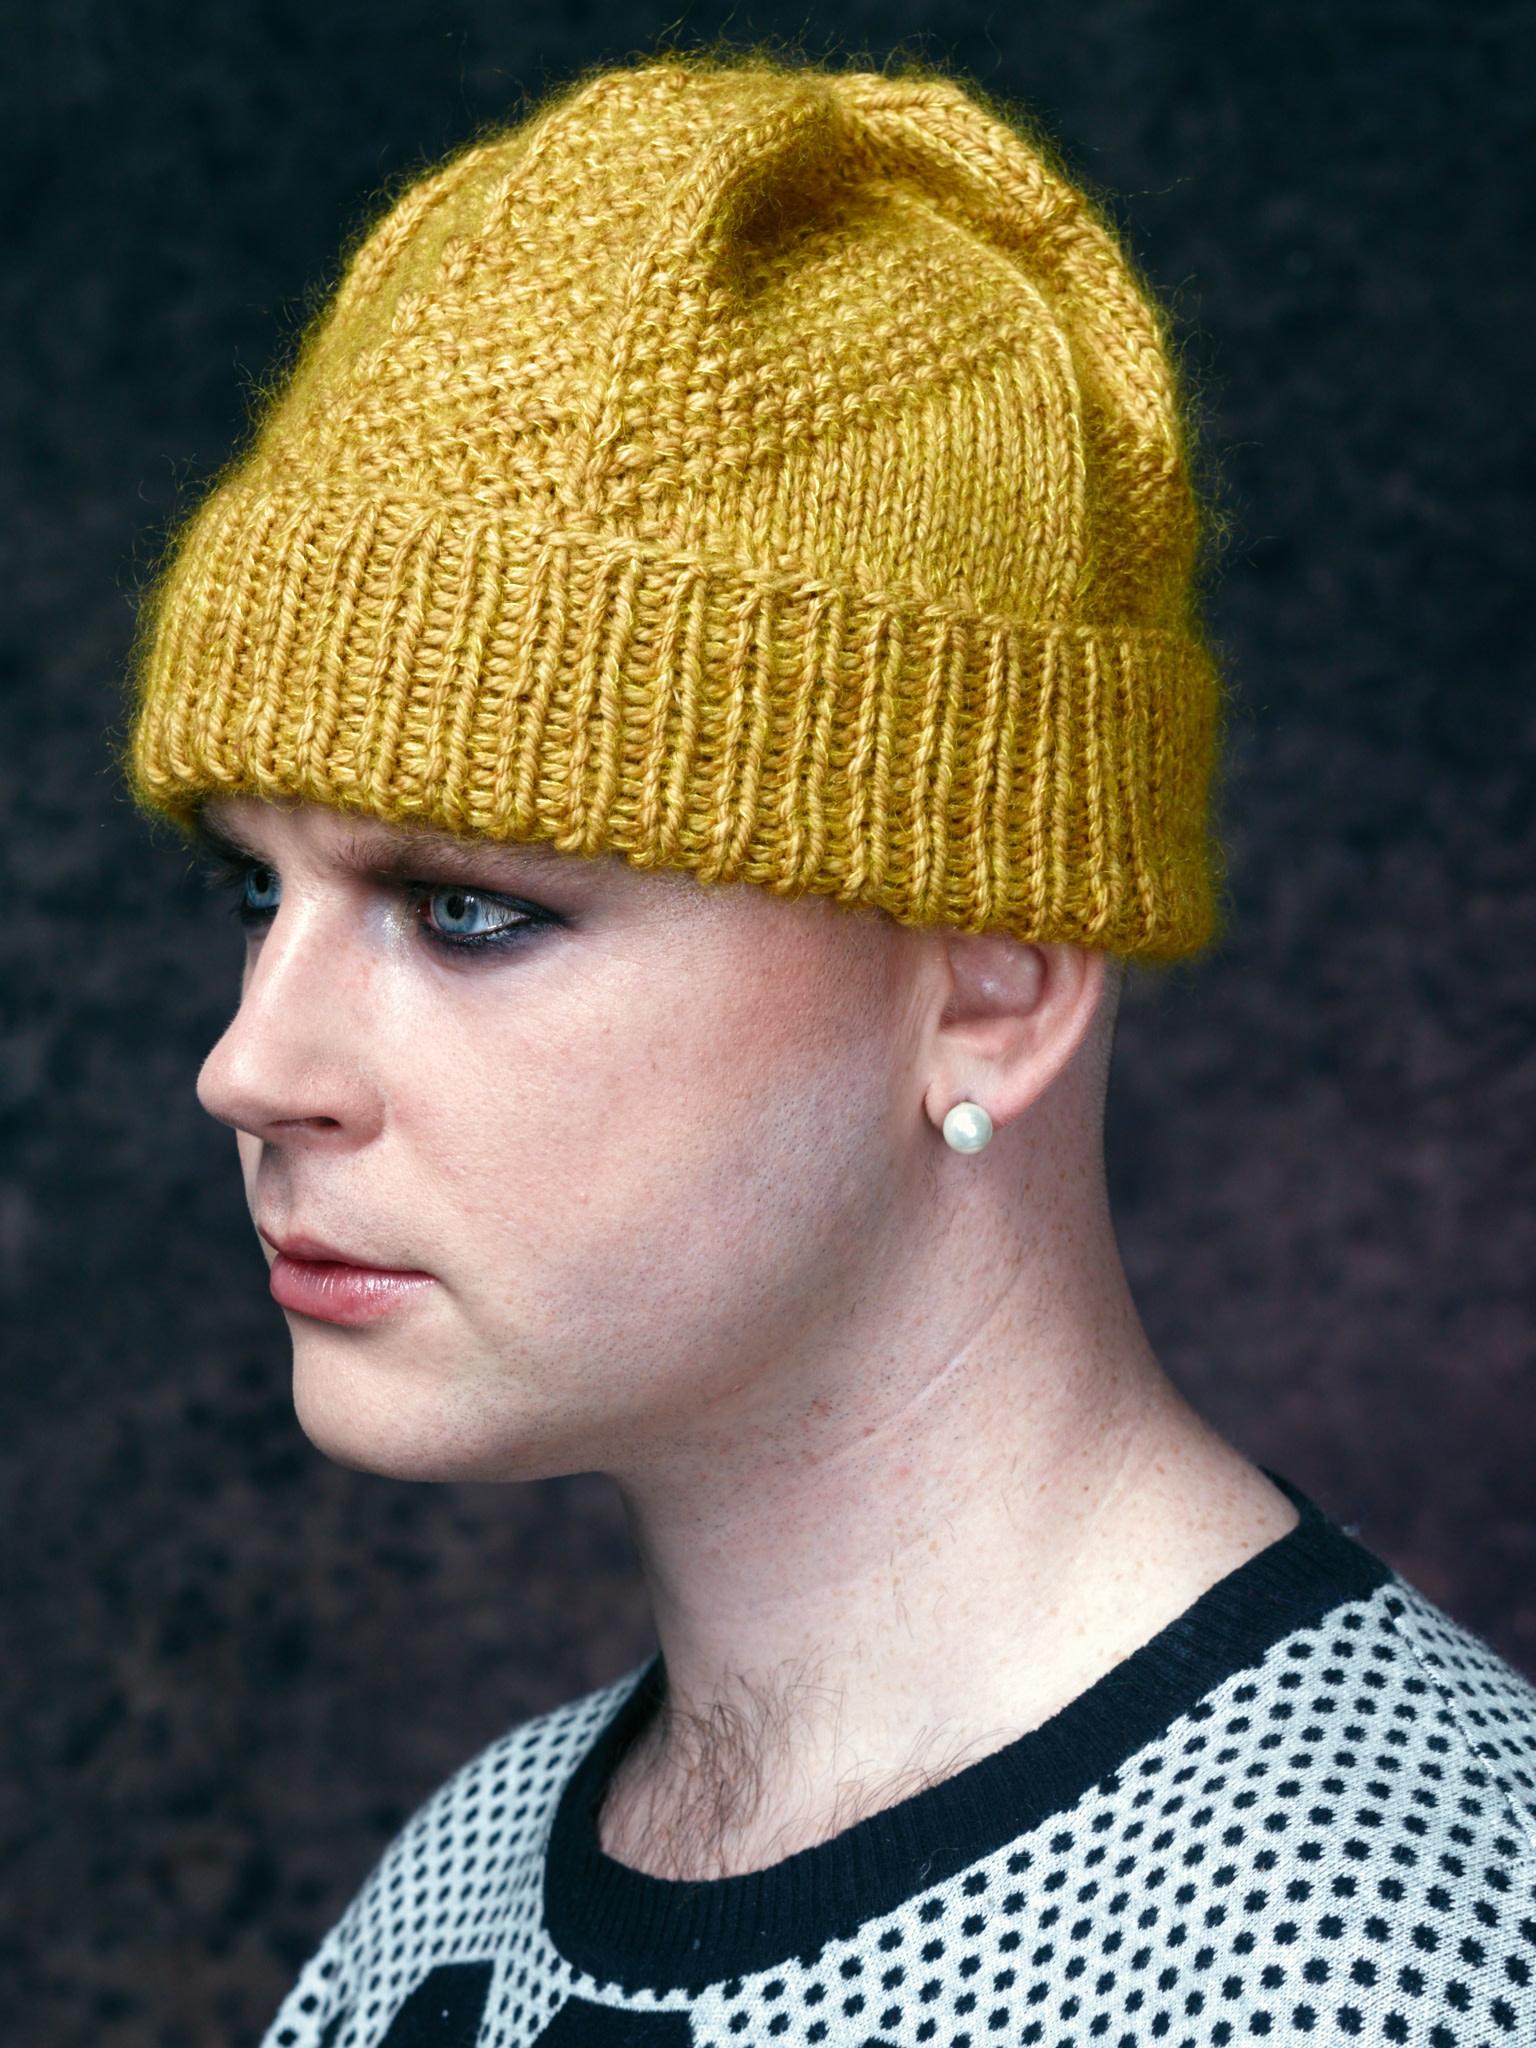 Westknits WK HIBERKNITTING HAT - KIT BRACKISH